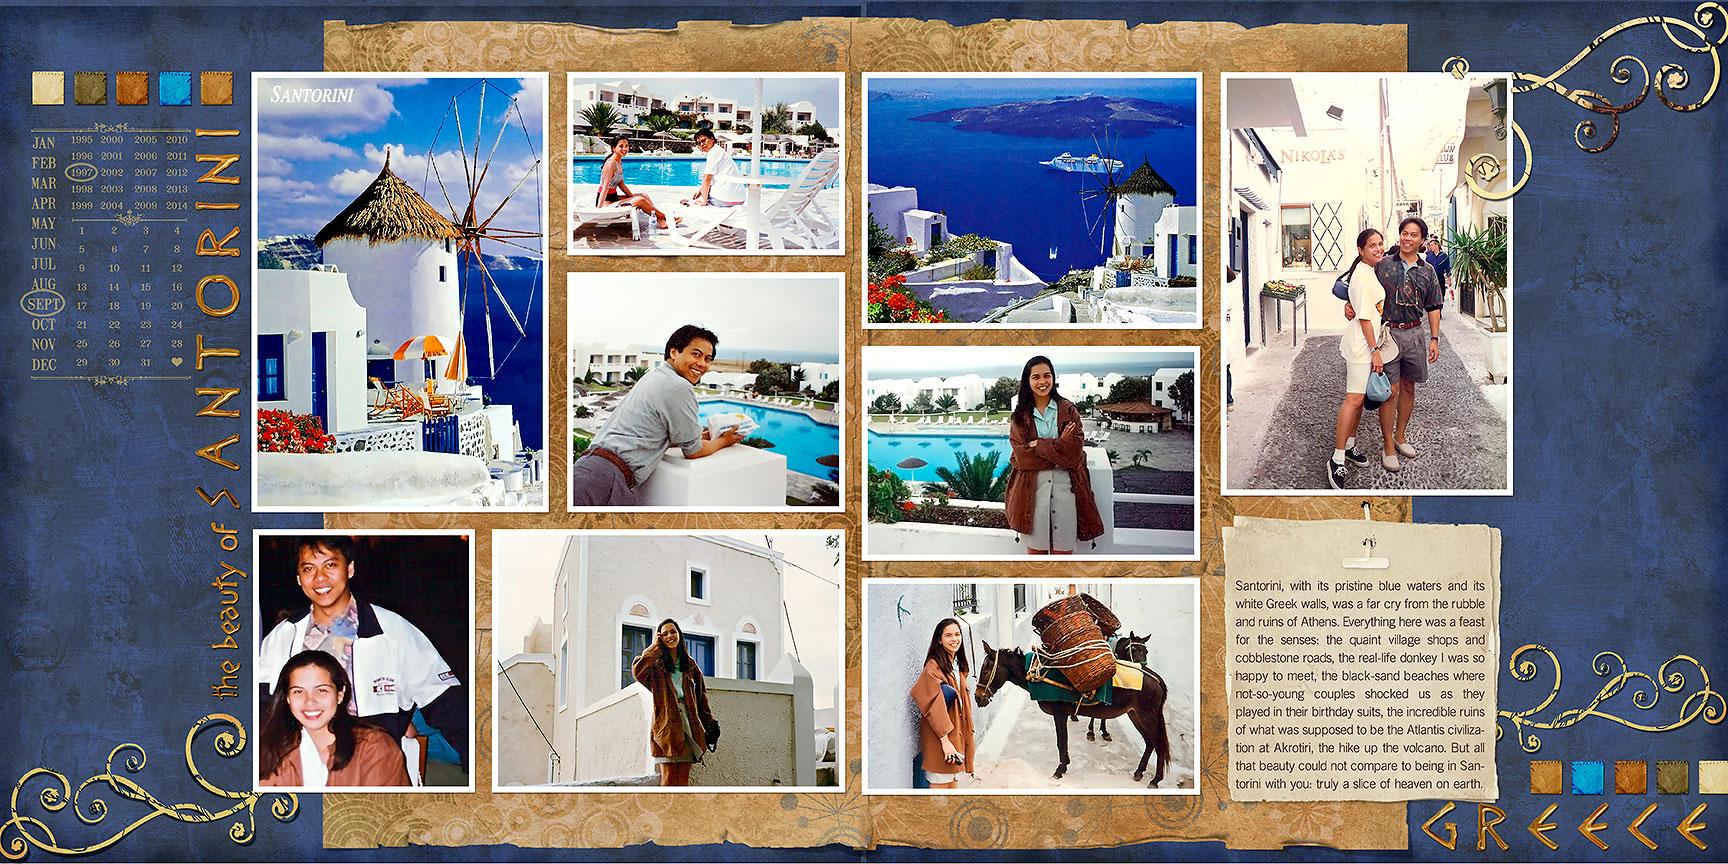 The Beauty of Santorini